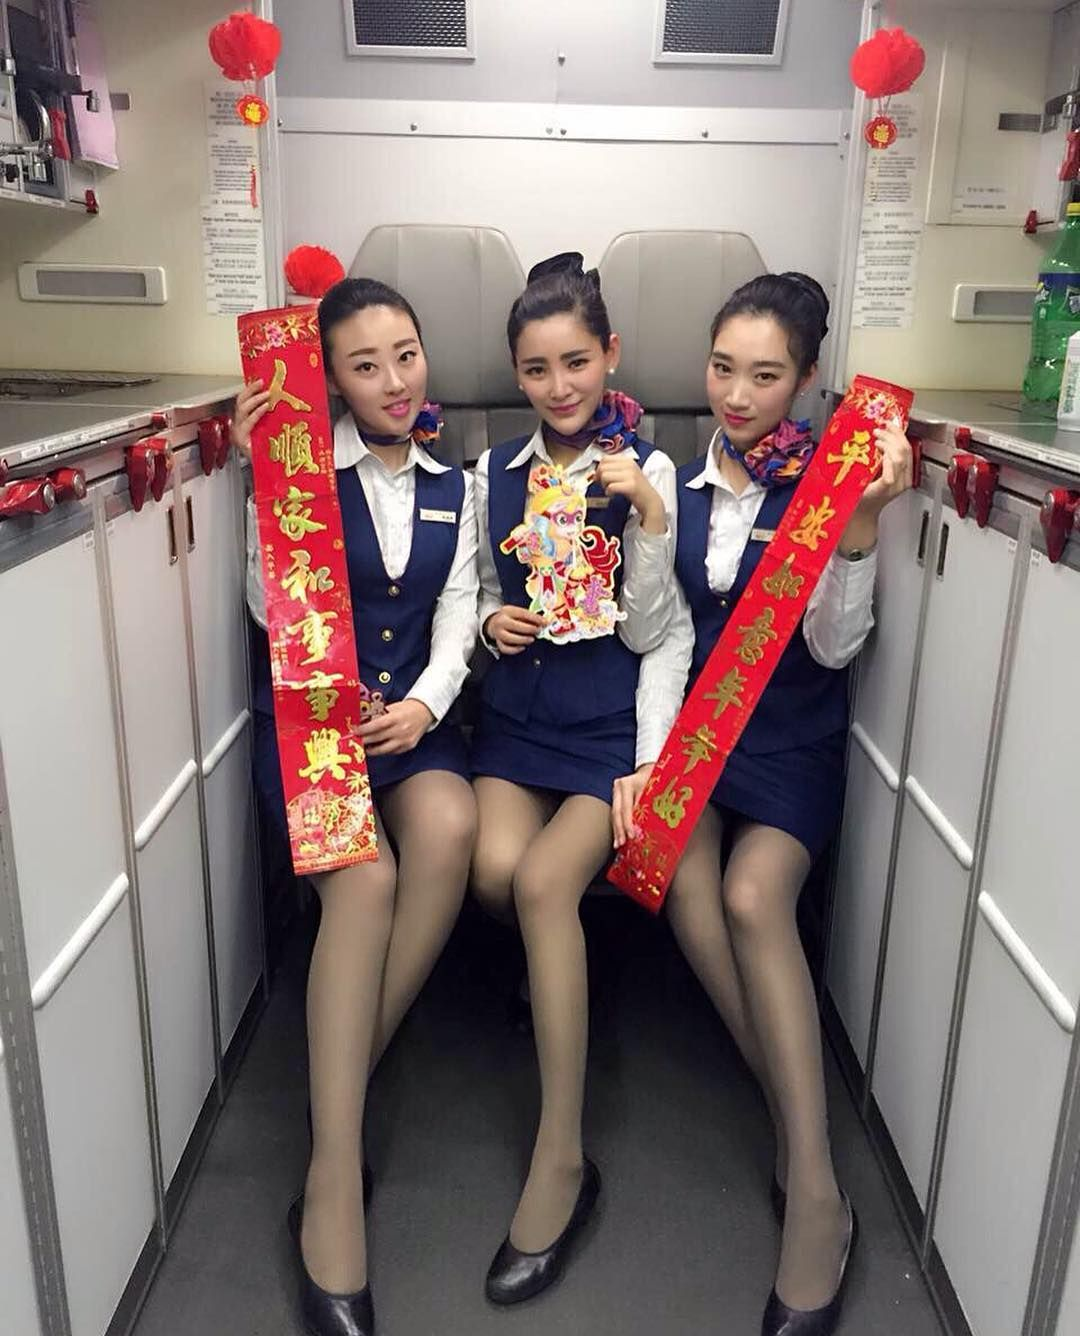 「Beautiful Stewardess」のおすすめ画像 1045 件 | Pinterest | 客室乗務員